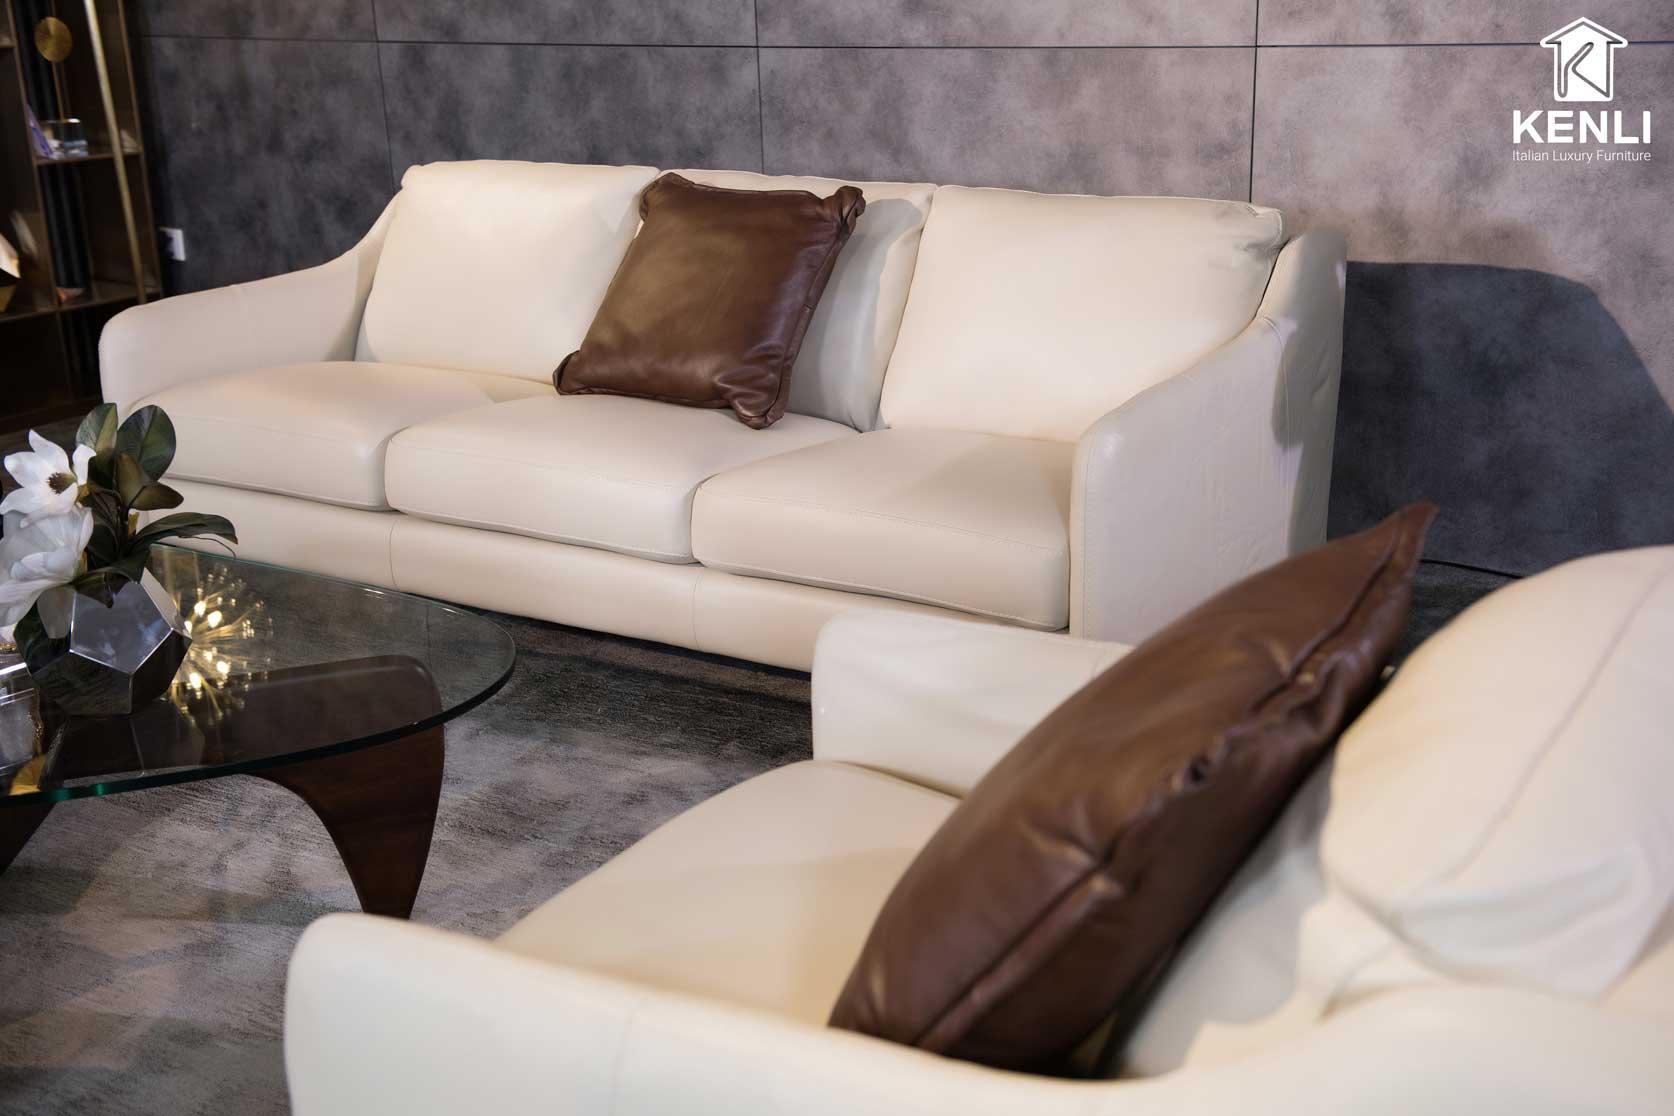 Sofa da thật E130 full bộ4